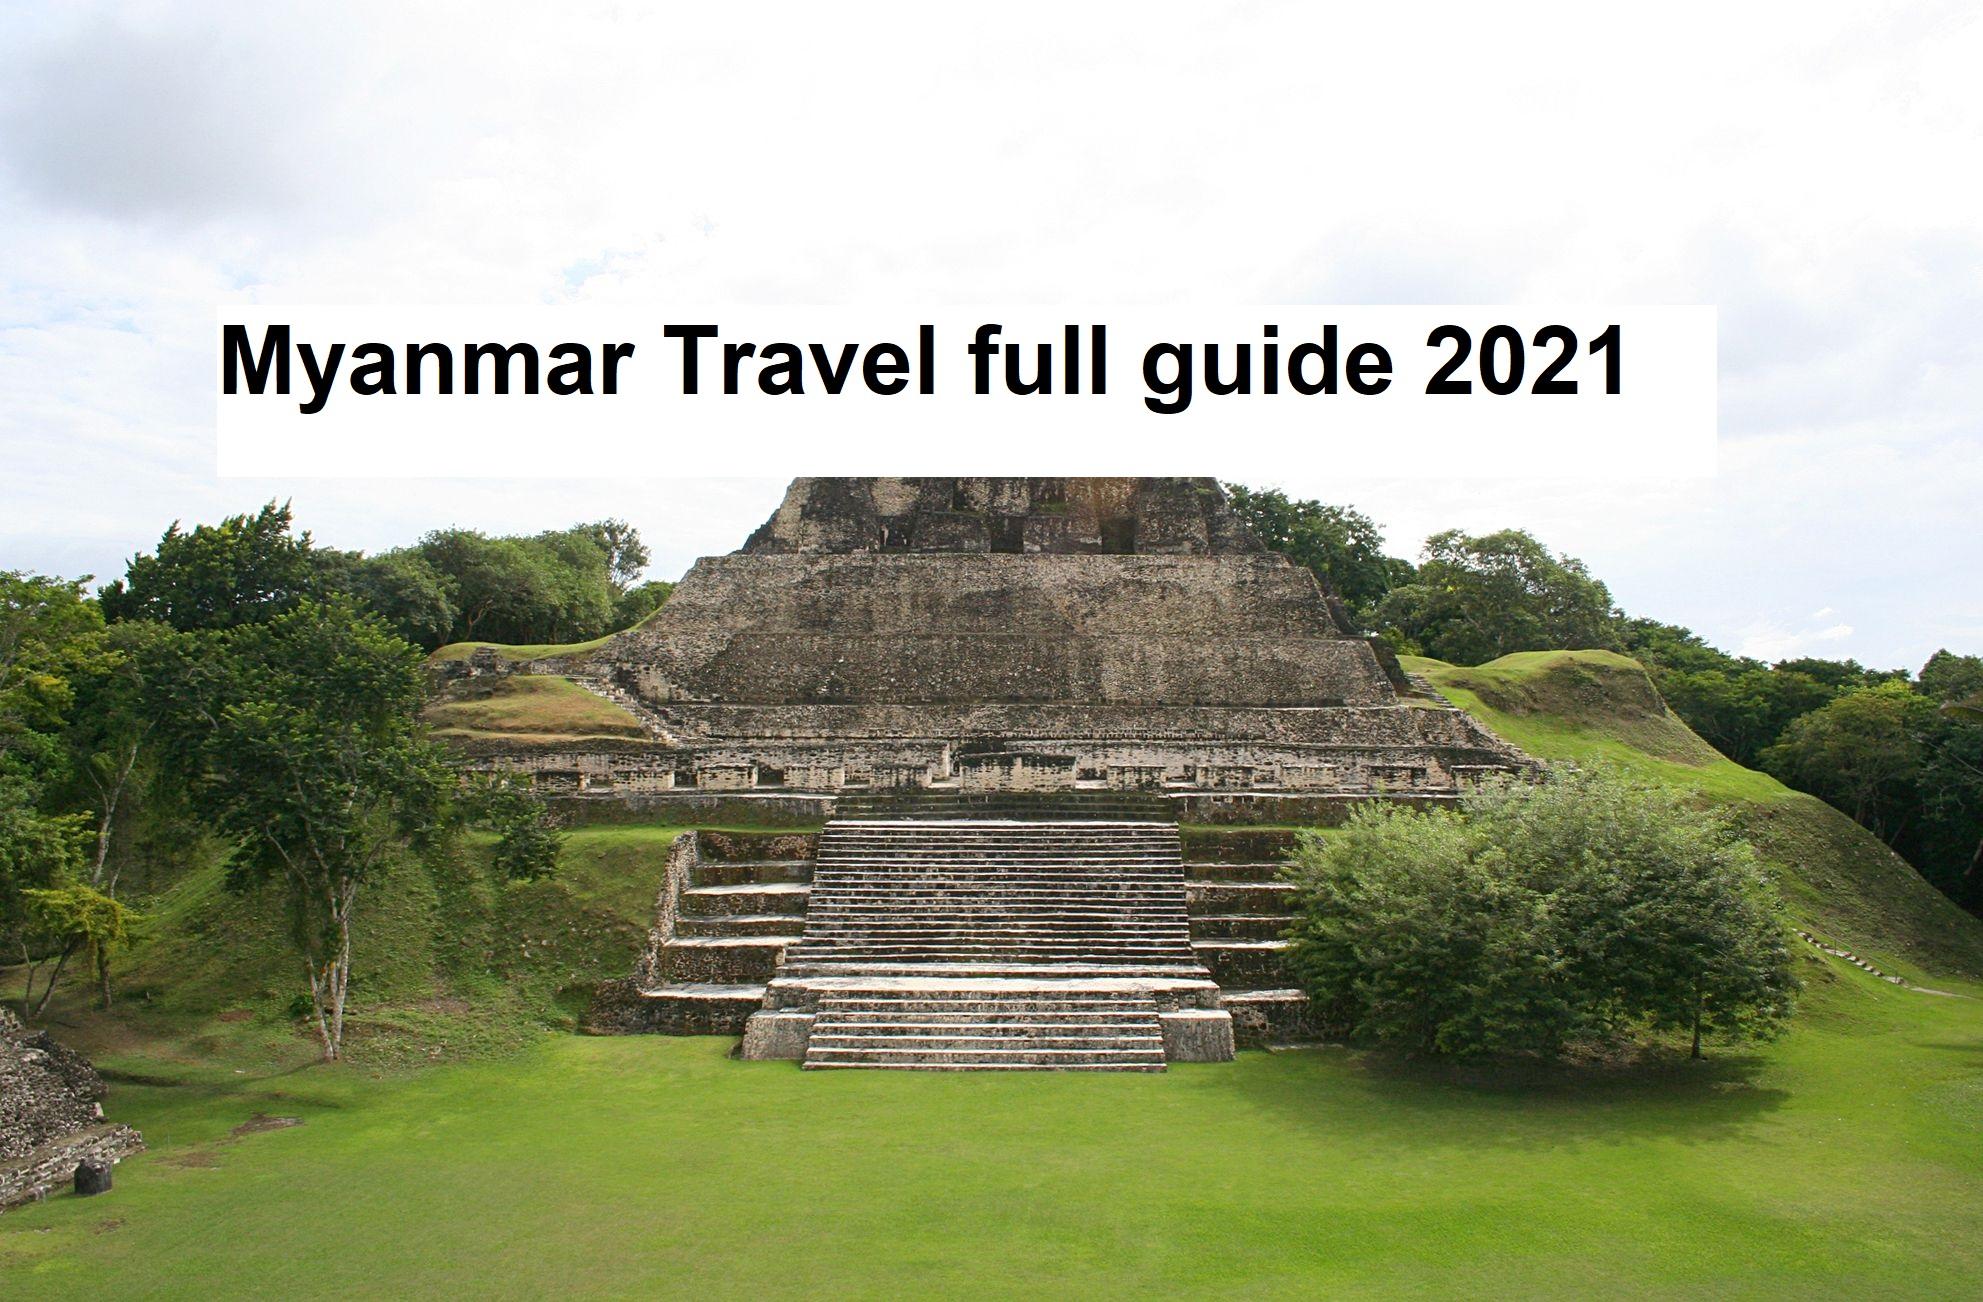 Myanmar Travel full guide 2021